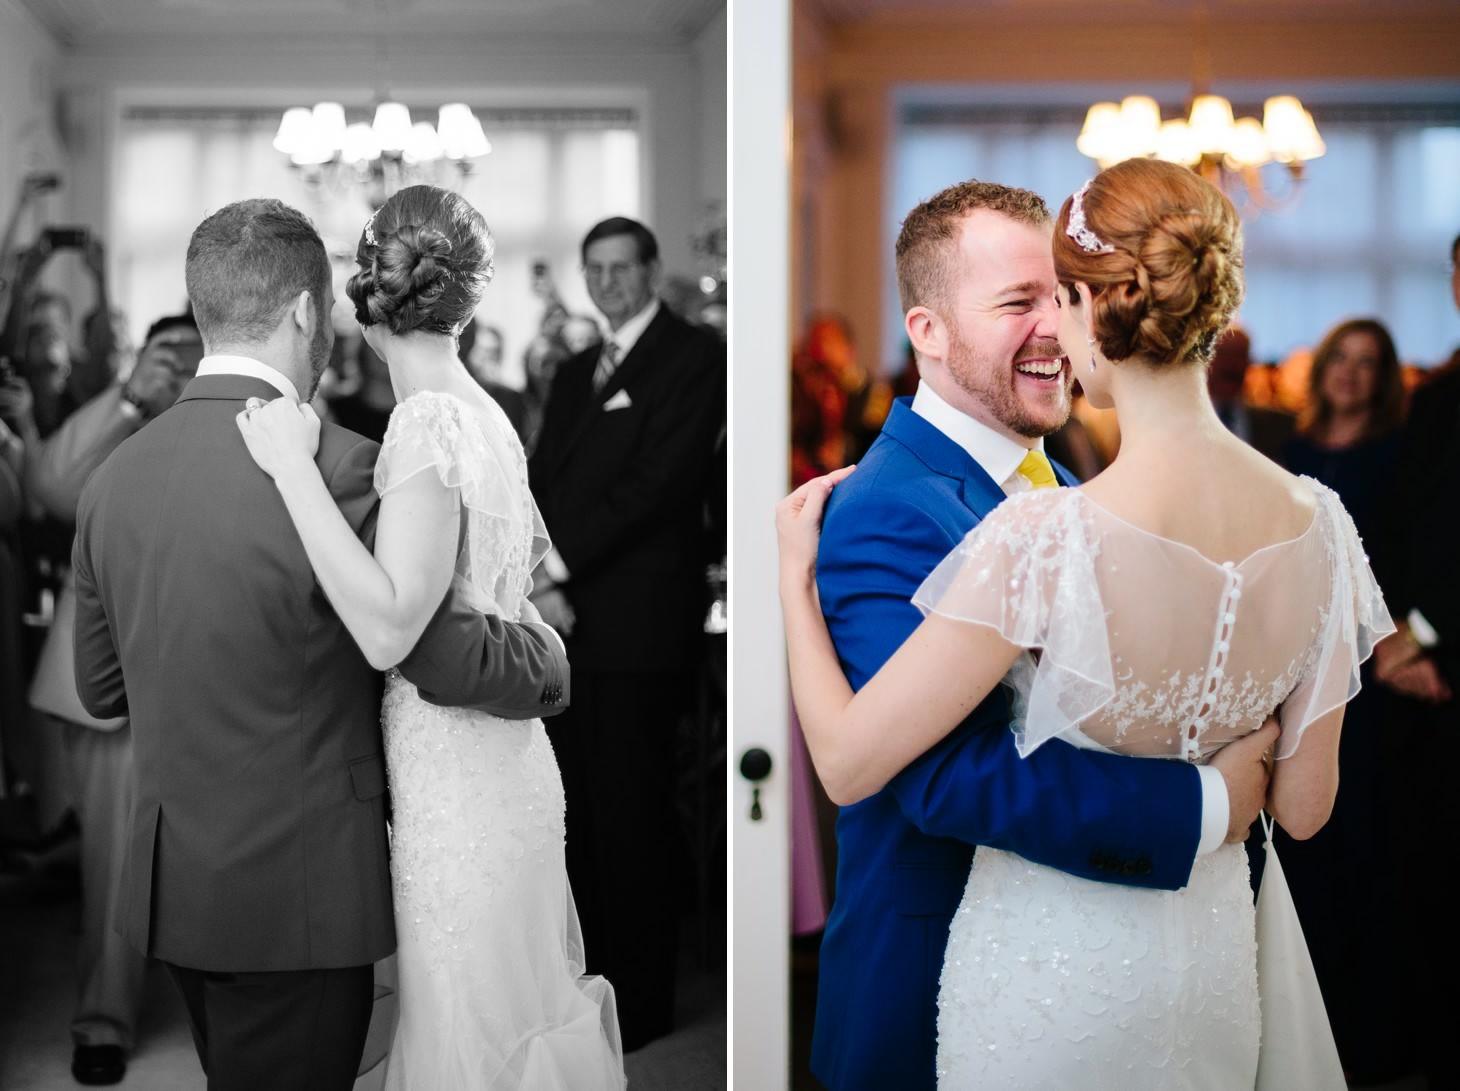 x-brooklyn-restaurant-wedding-nyc-weddingi-photographer-smitten-chickens166.jpg